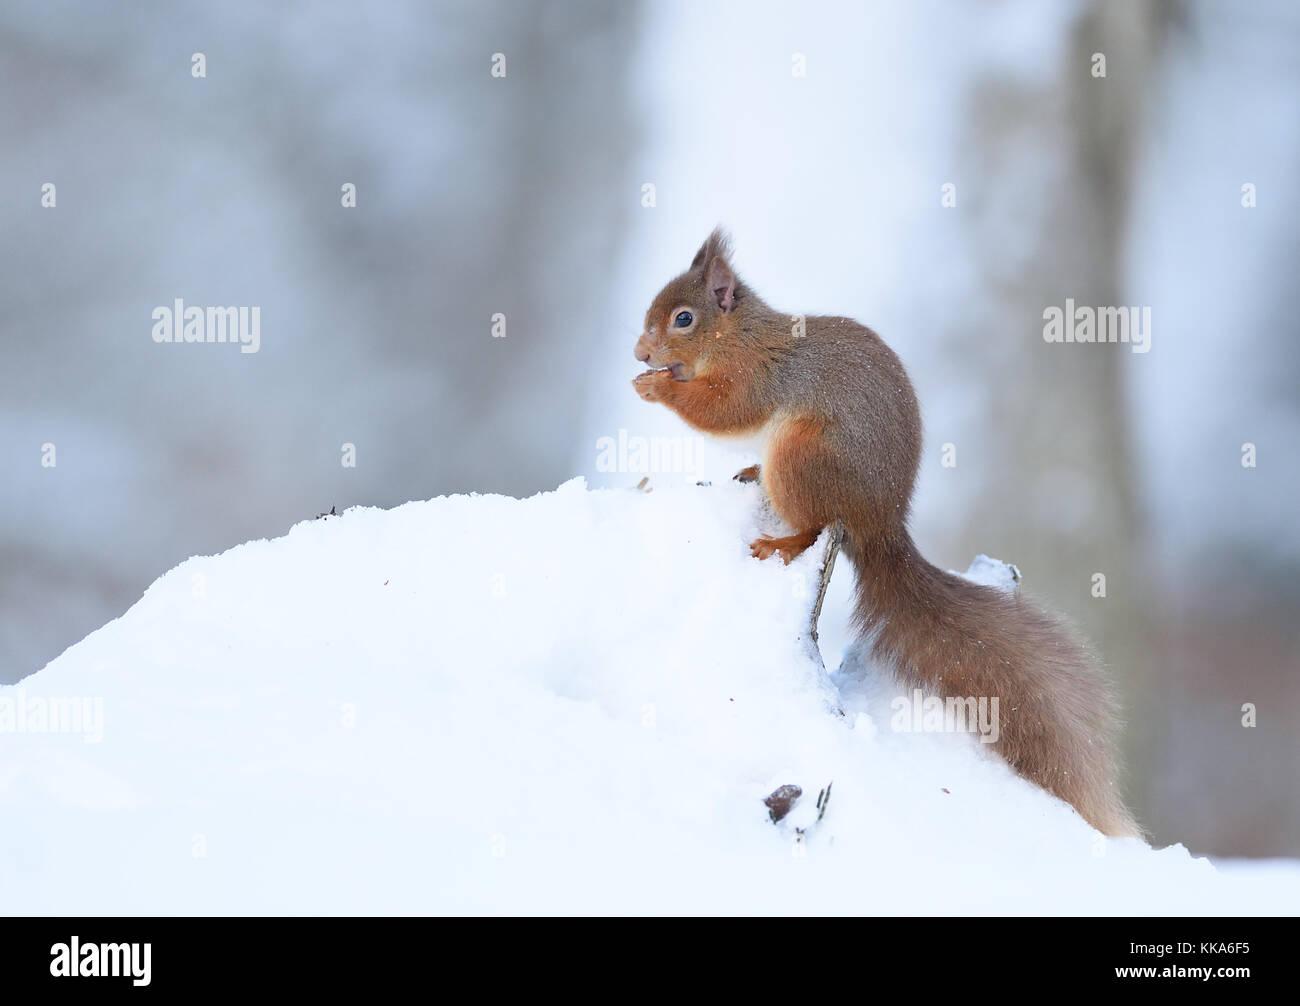 Scottish Winter Wildlife - Stock Image